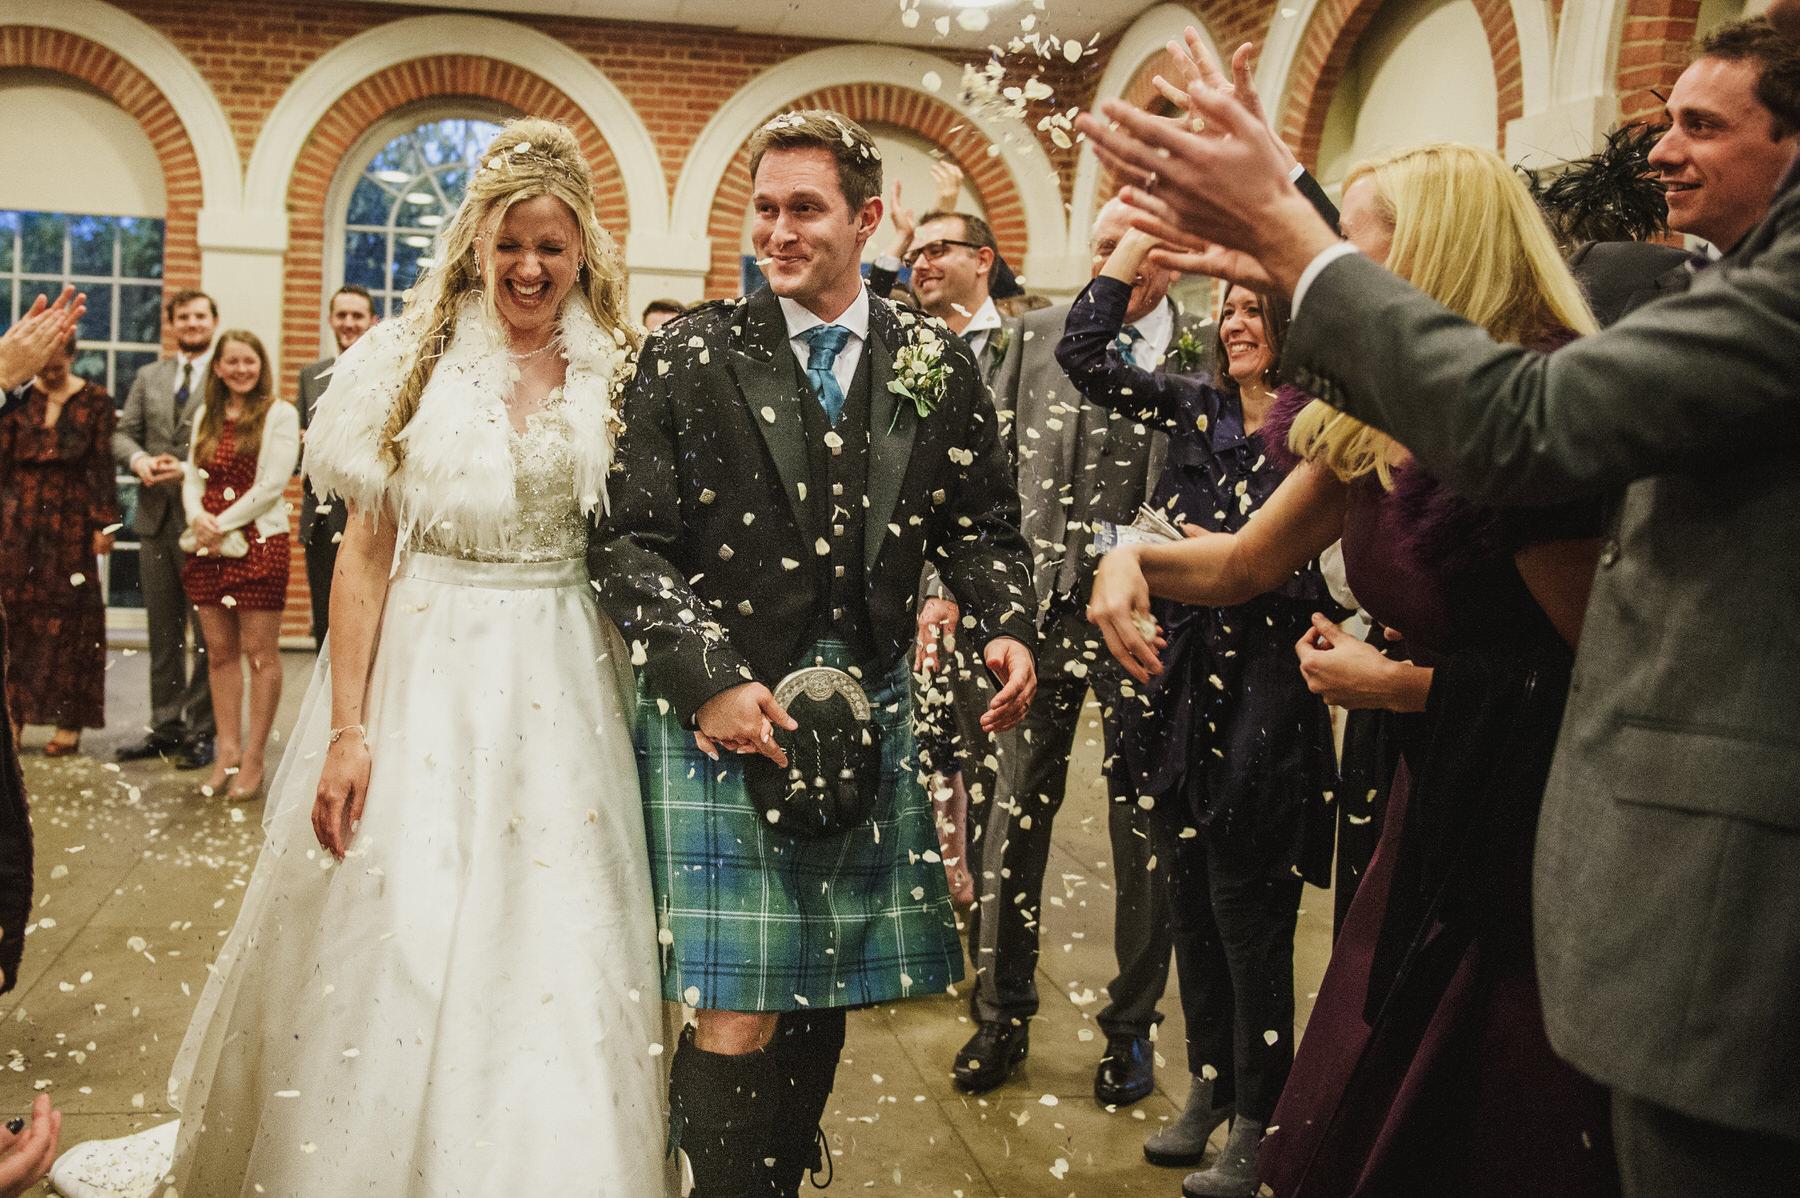 Great Fosters wedding confetti